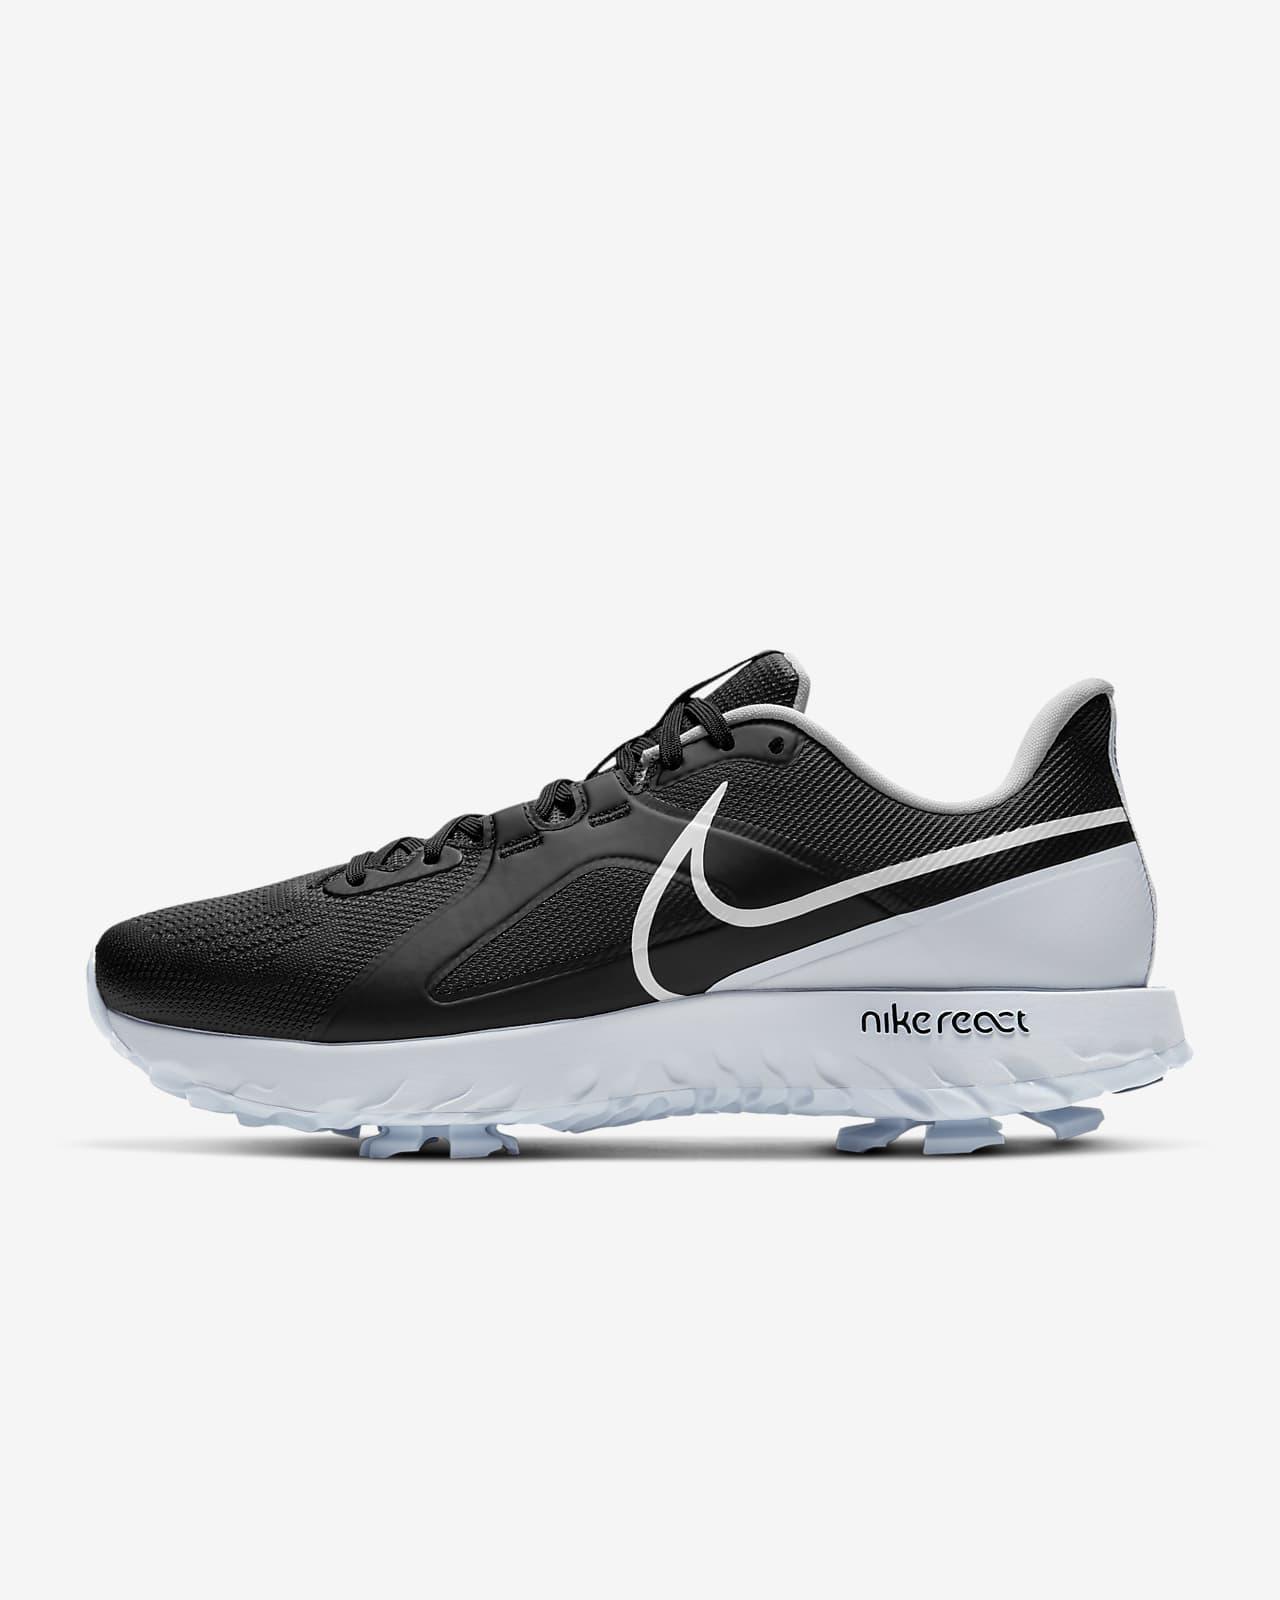 Scarpa da golf Nike React Infinity Pro